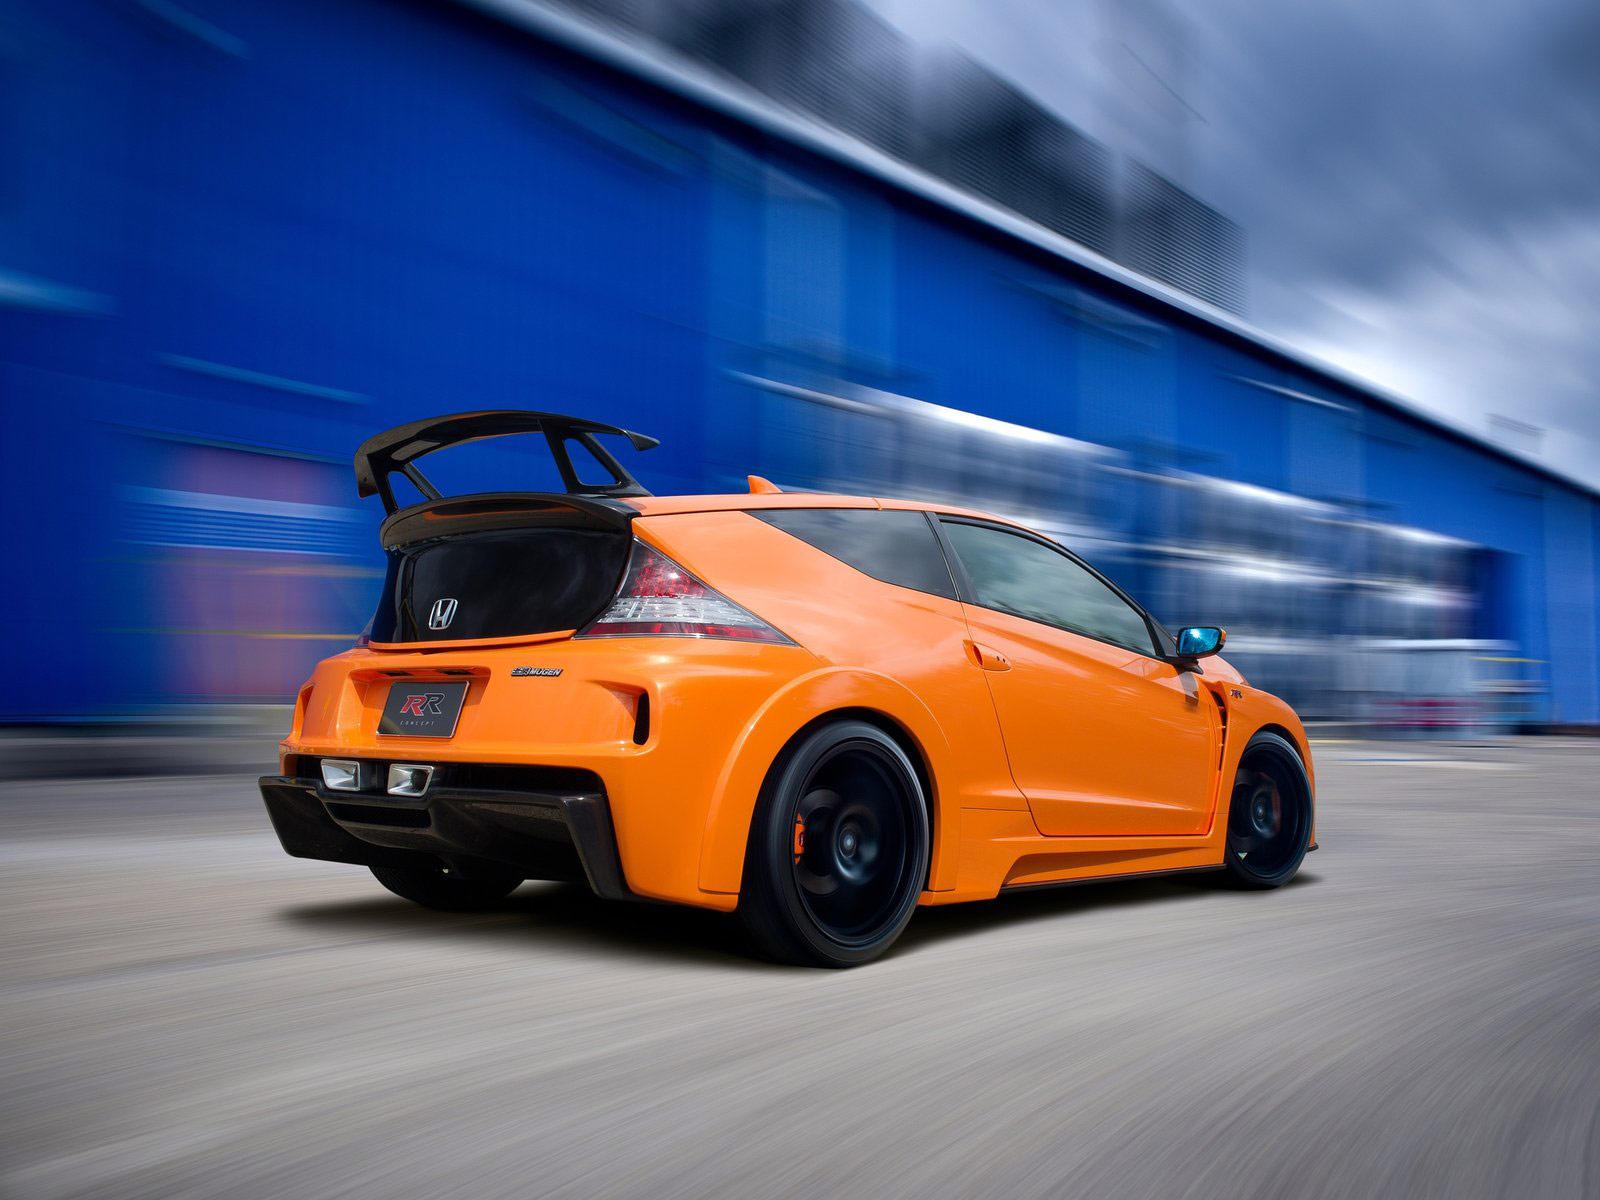 http://4.bp.blogspot.com/-Z6niE055loM/TkvKCJWDKGI/AAAAAAAACr0/jjpPMIElM8I/s1600/Honda-CR-Z_Mugen_RR_Concept_japanese-car-wallpaper_3.jpg